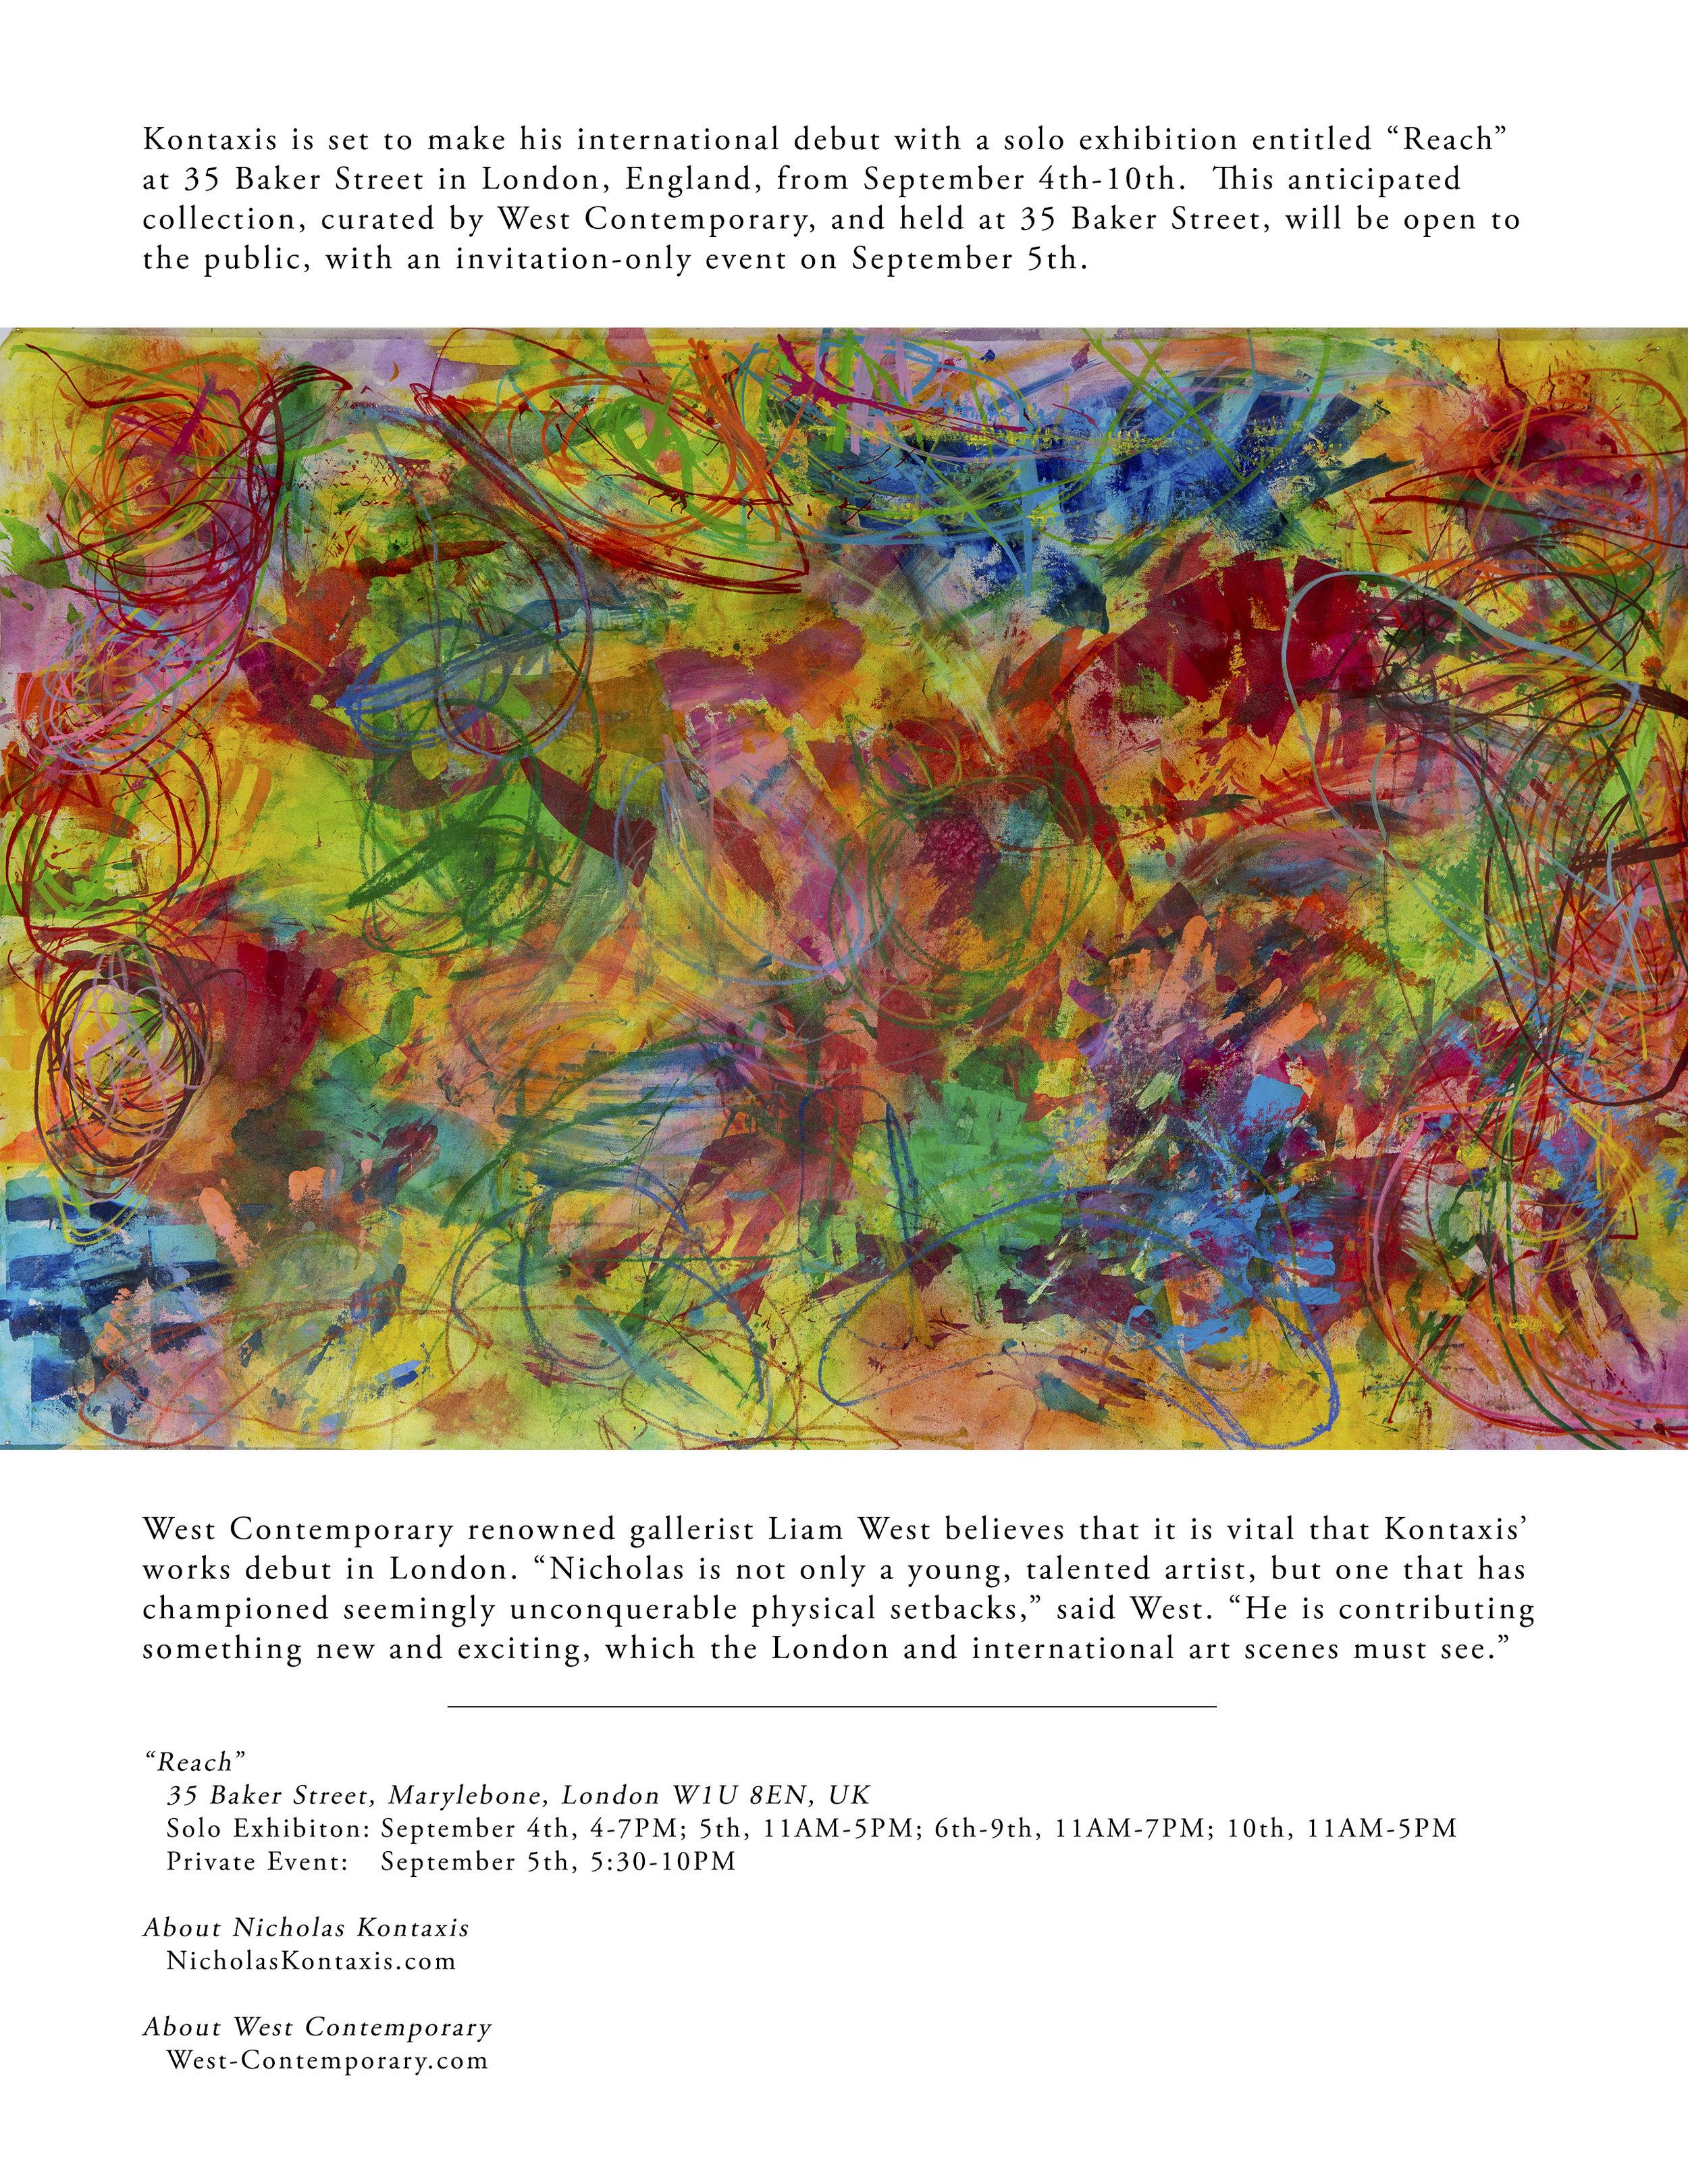 Reach Premiere Press Release NK final page 4.jpg